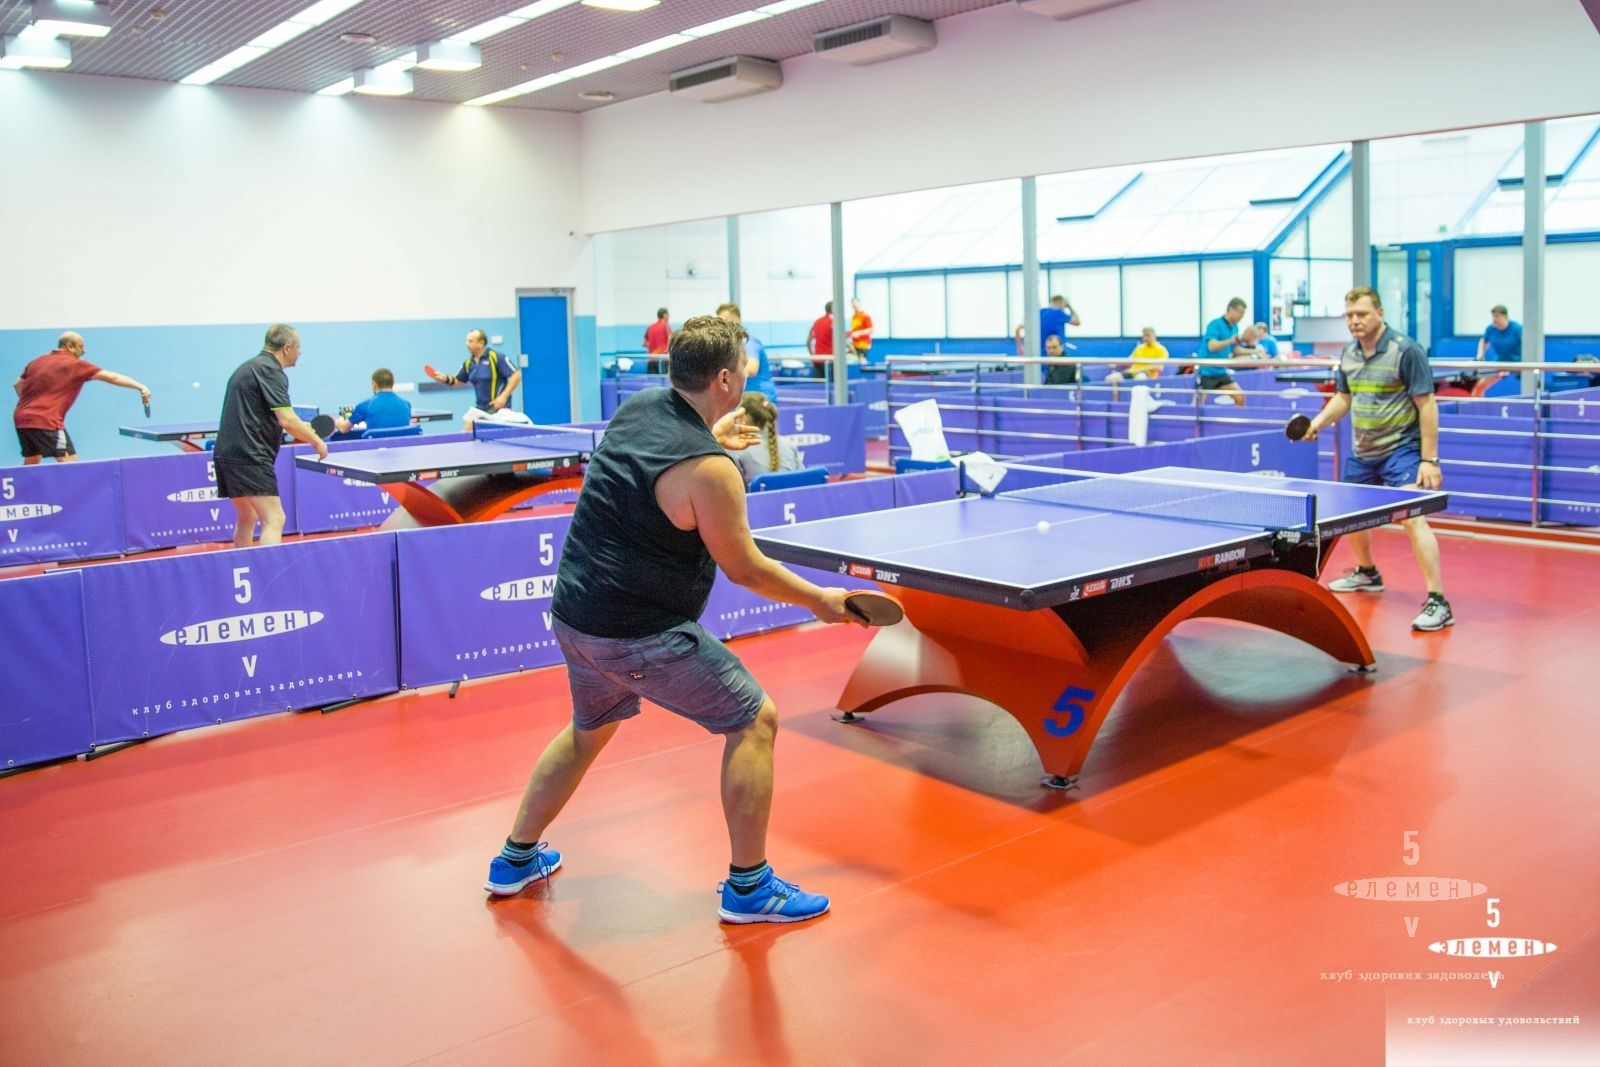 5 element table tennis series 2018— элитный семейный Фитнес-центр 5 Элемент